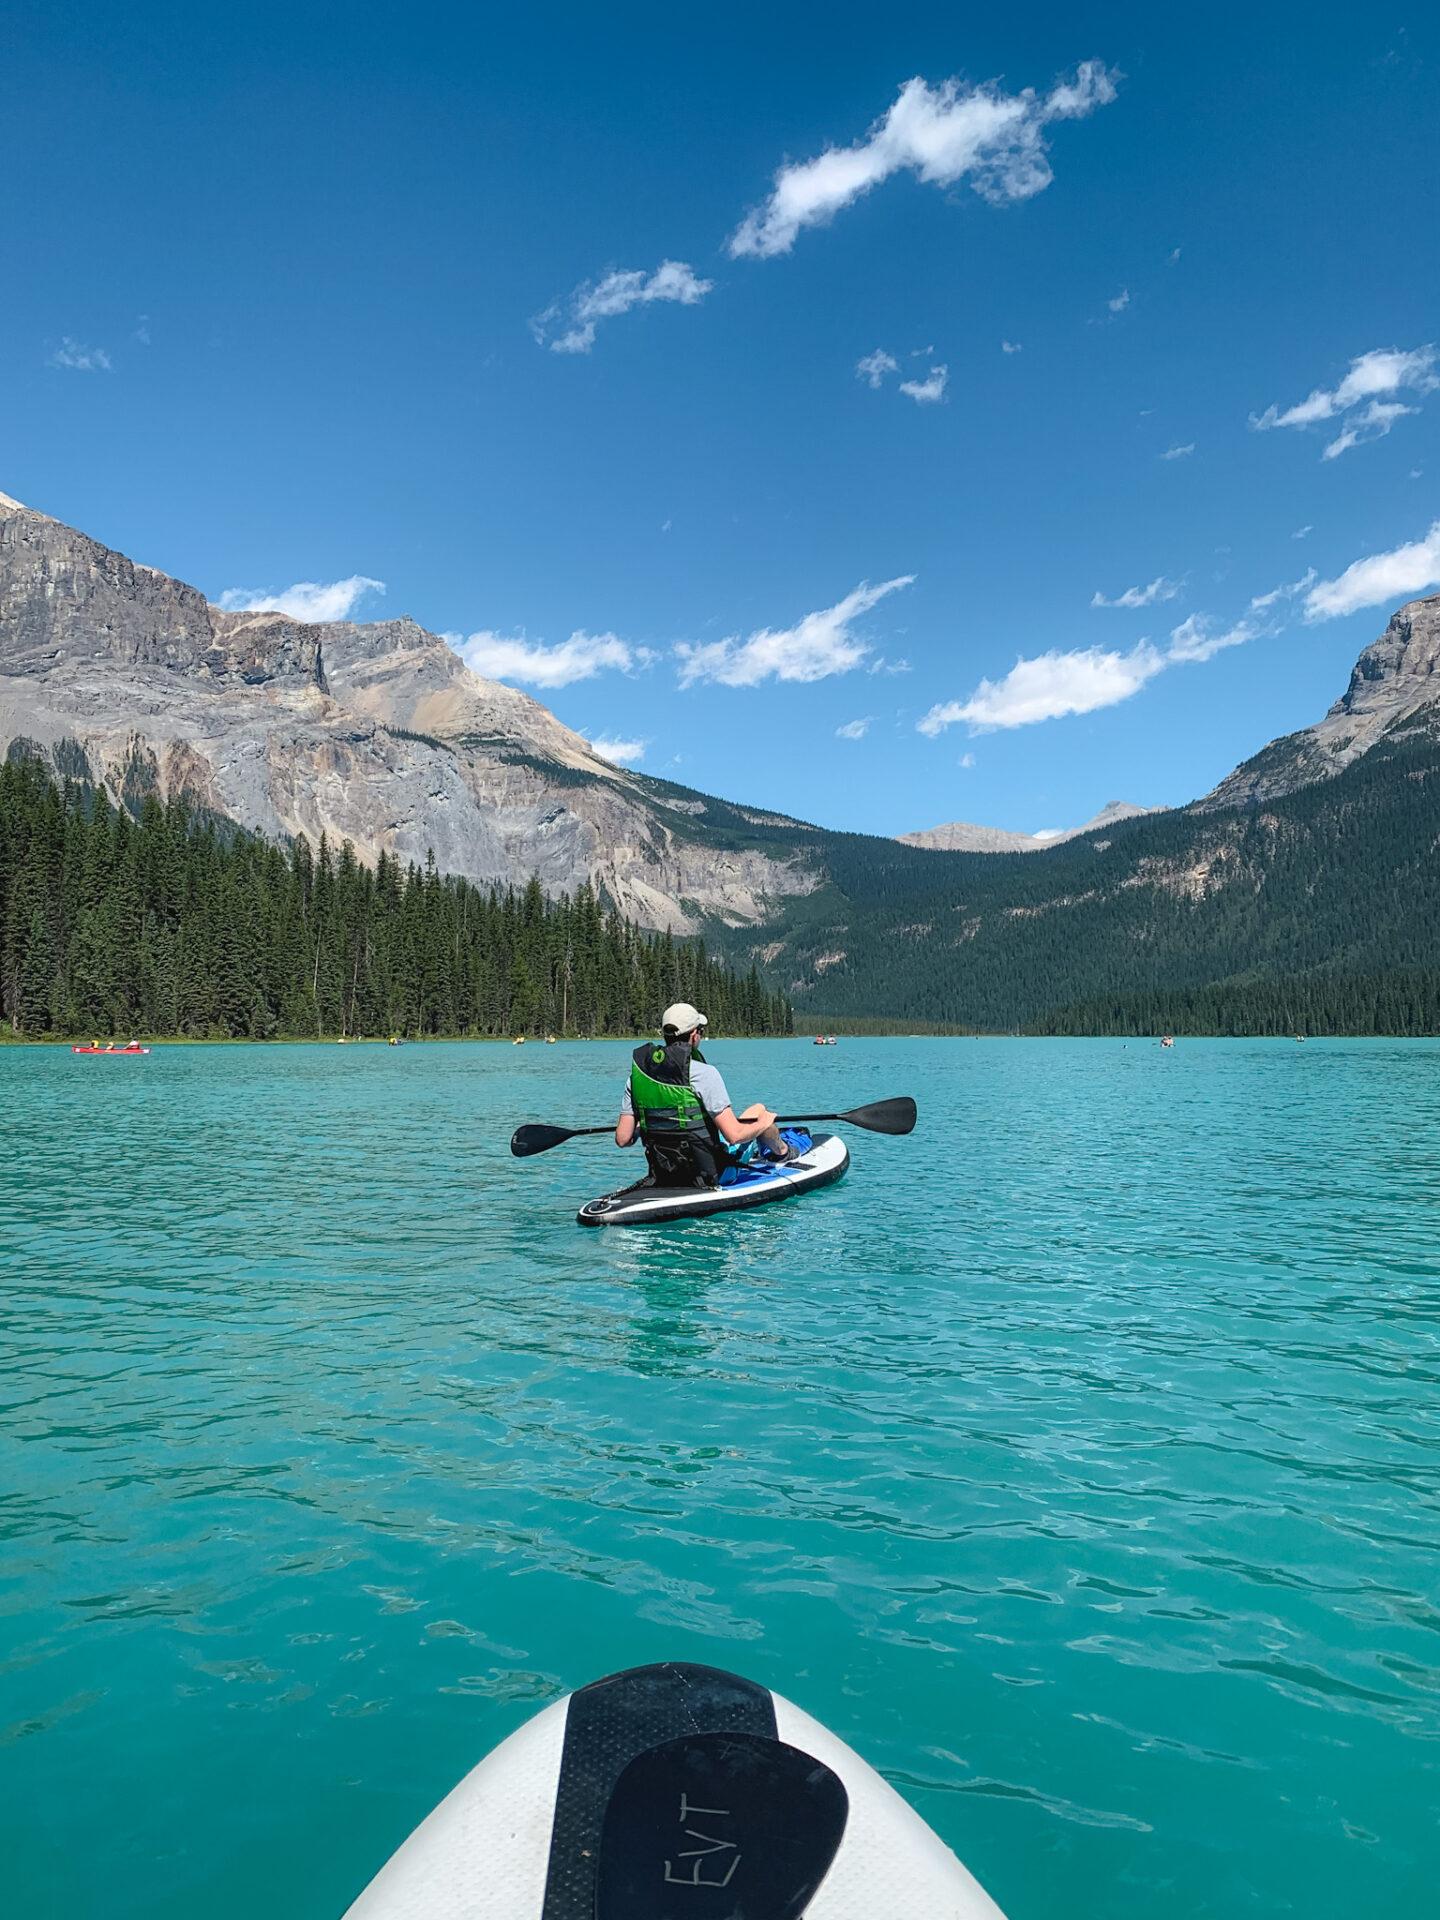 SUP boarding at Emerald Lake in Yoho National Park, British Columbia